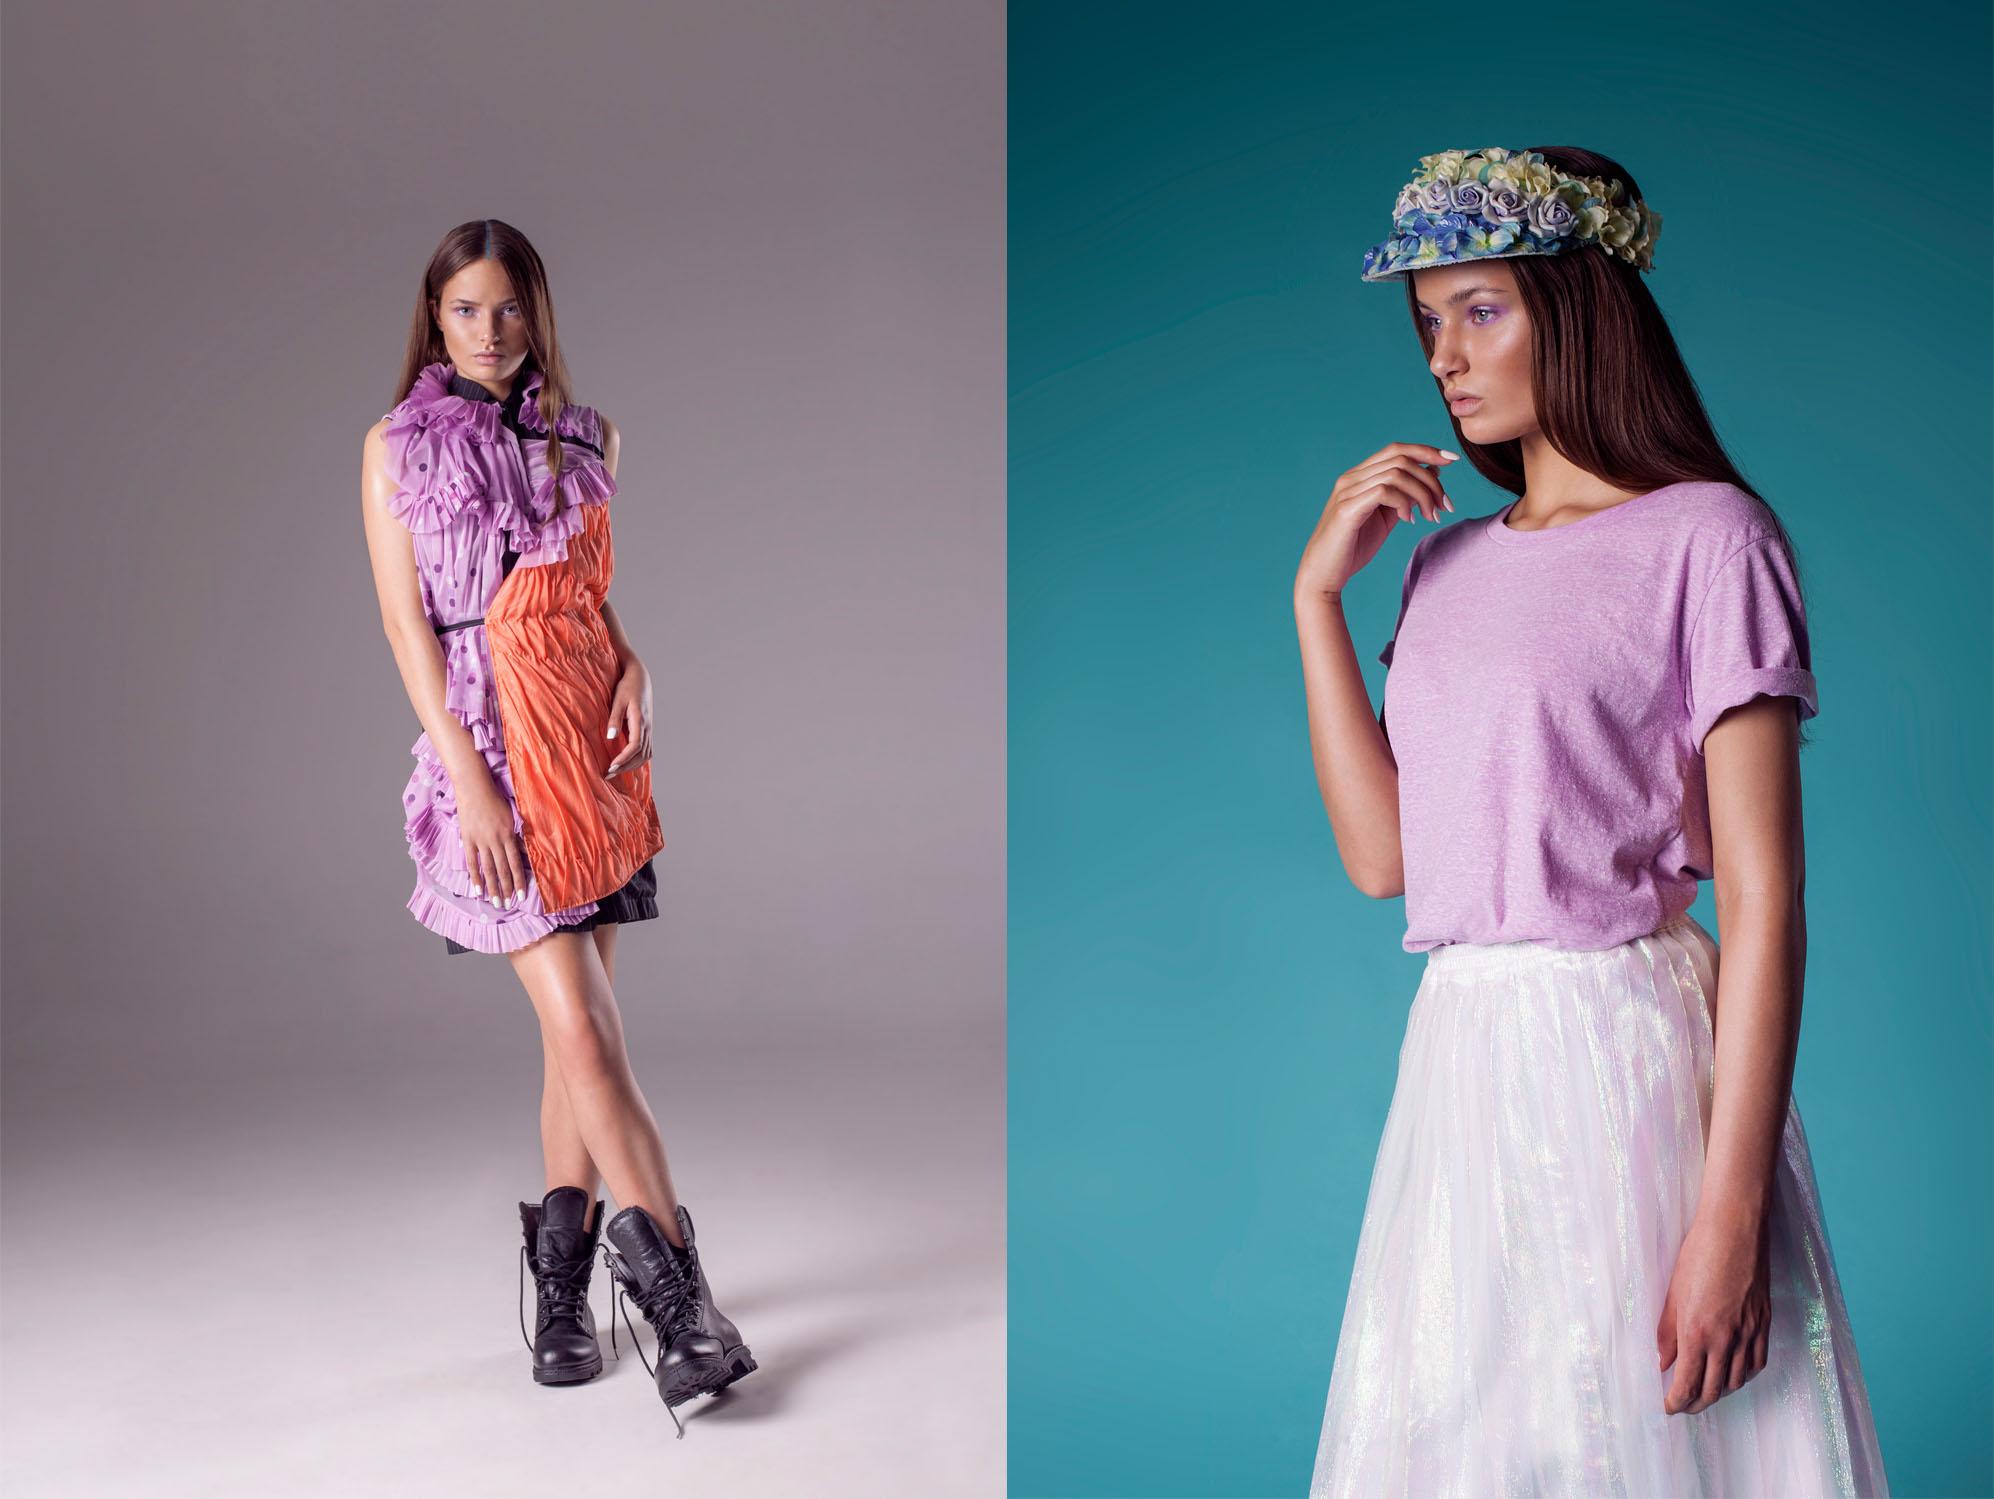 L: Dress Anne van de Boogaard; R: Flower cap Anne van de Boogaard, T-shirt Monki, Skirt: Monki